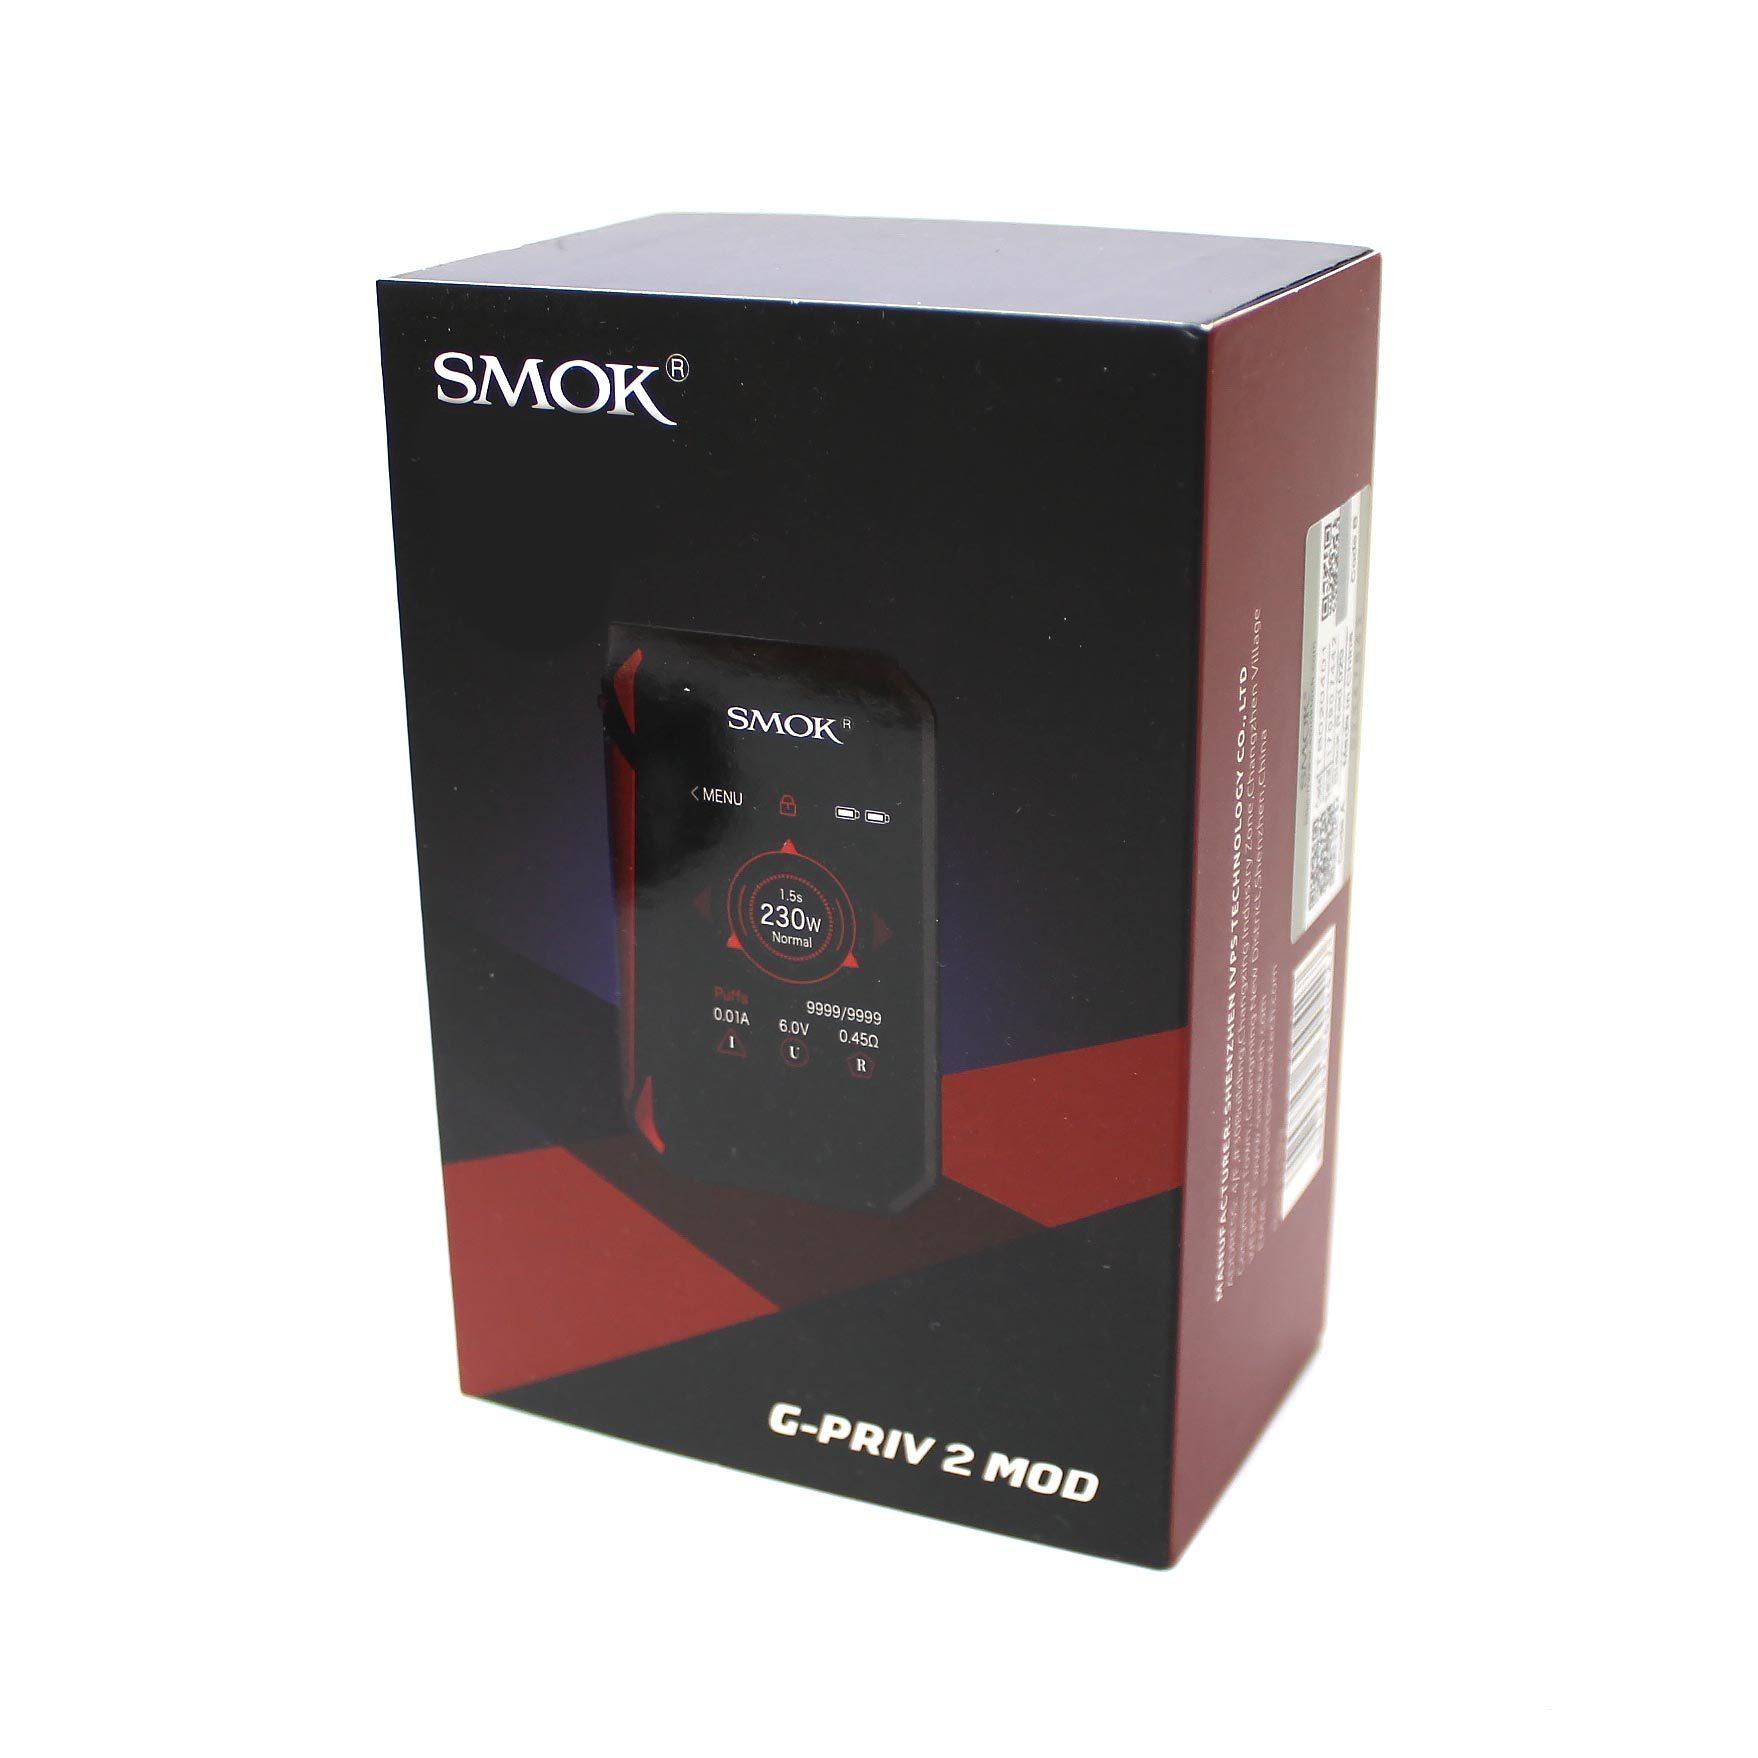 Фирменная коробка для боксмода Smok G-Priv 2